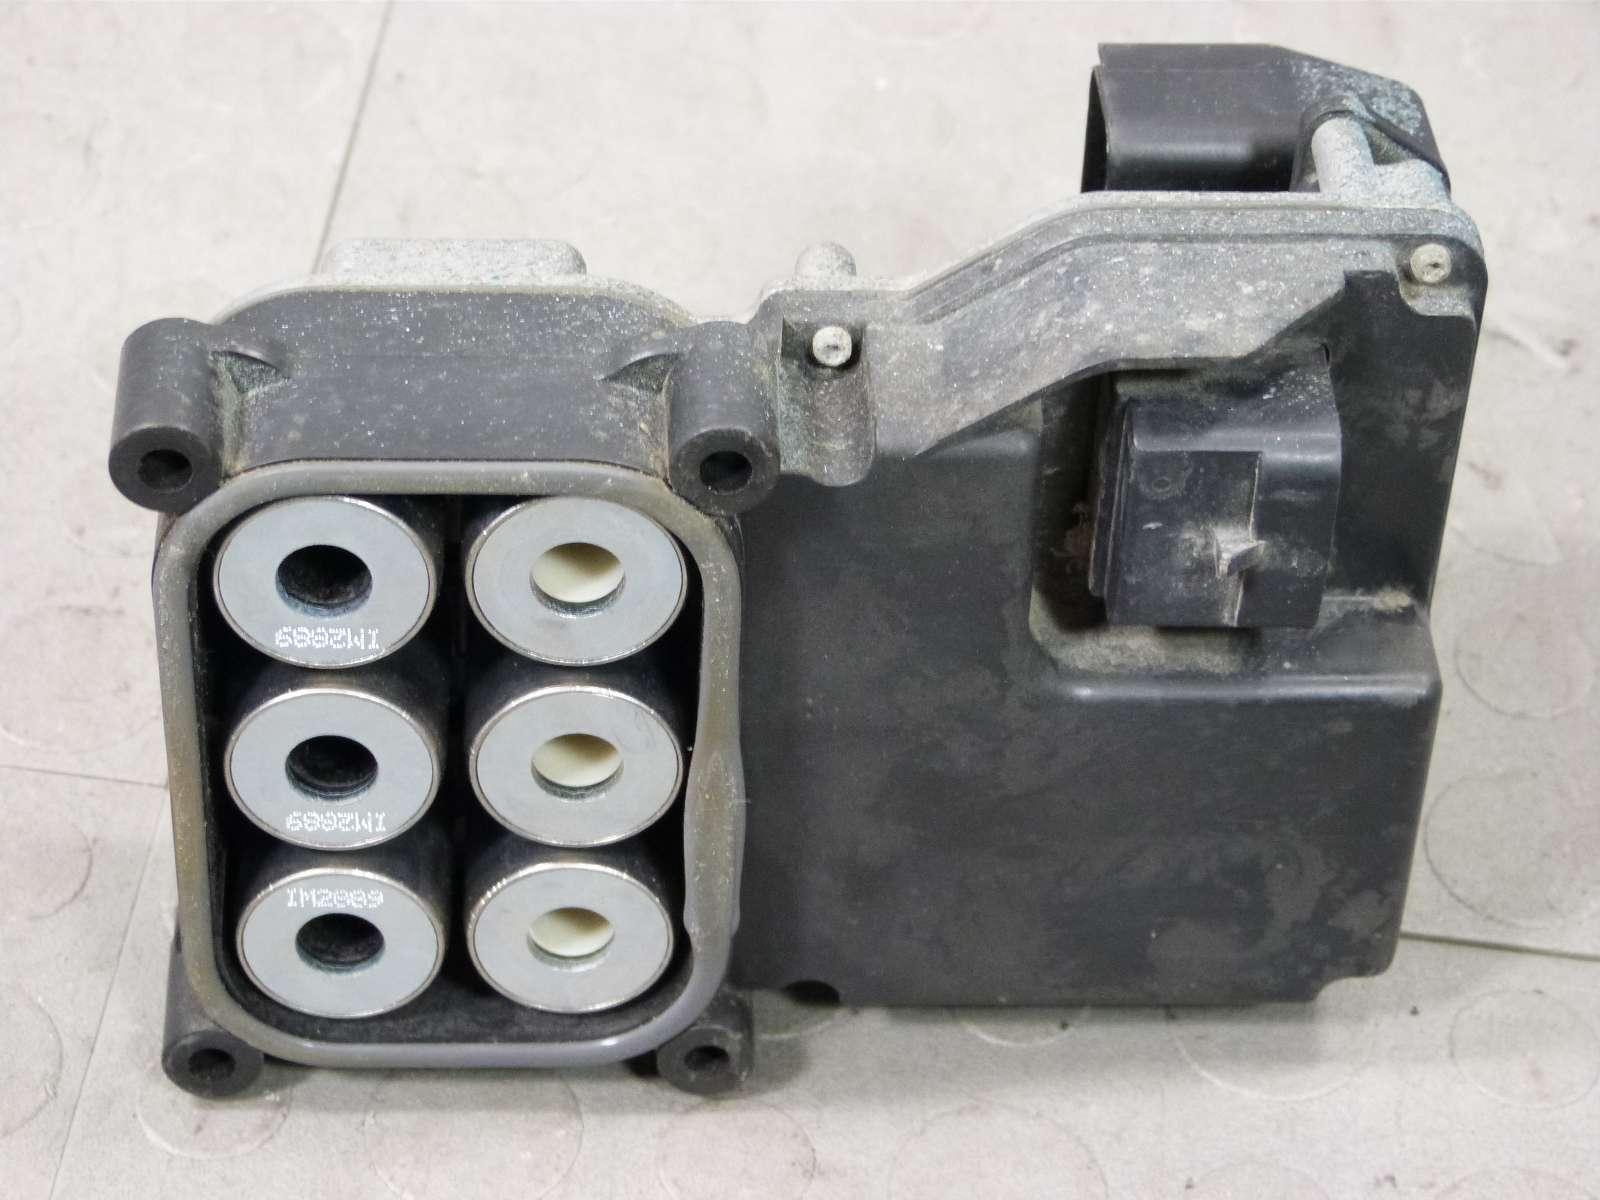 00 01 Dodge Ram 1500 2500 3500 Abs Control Module